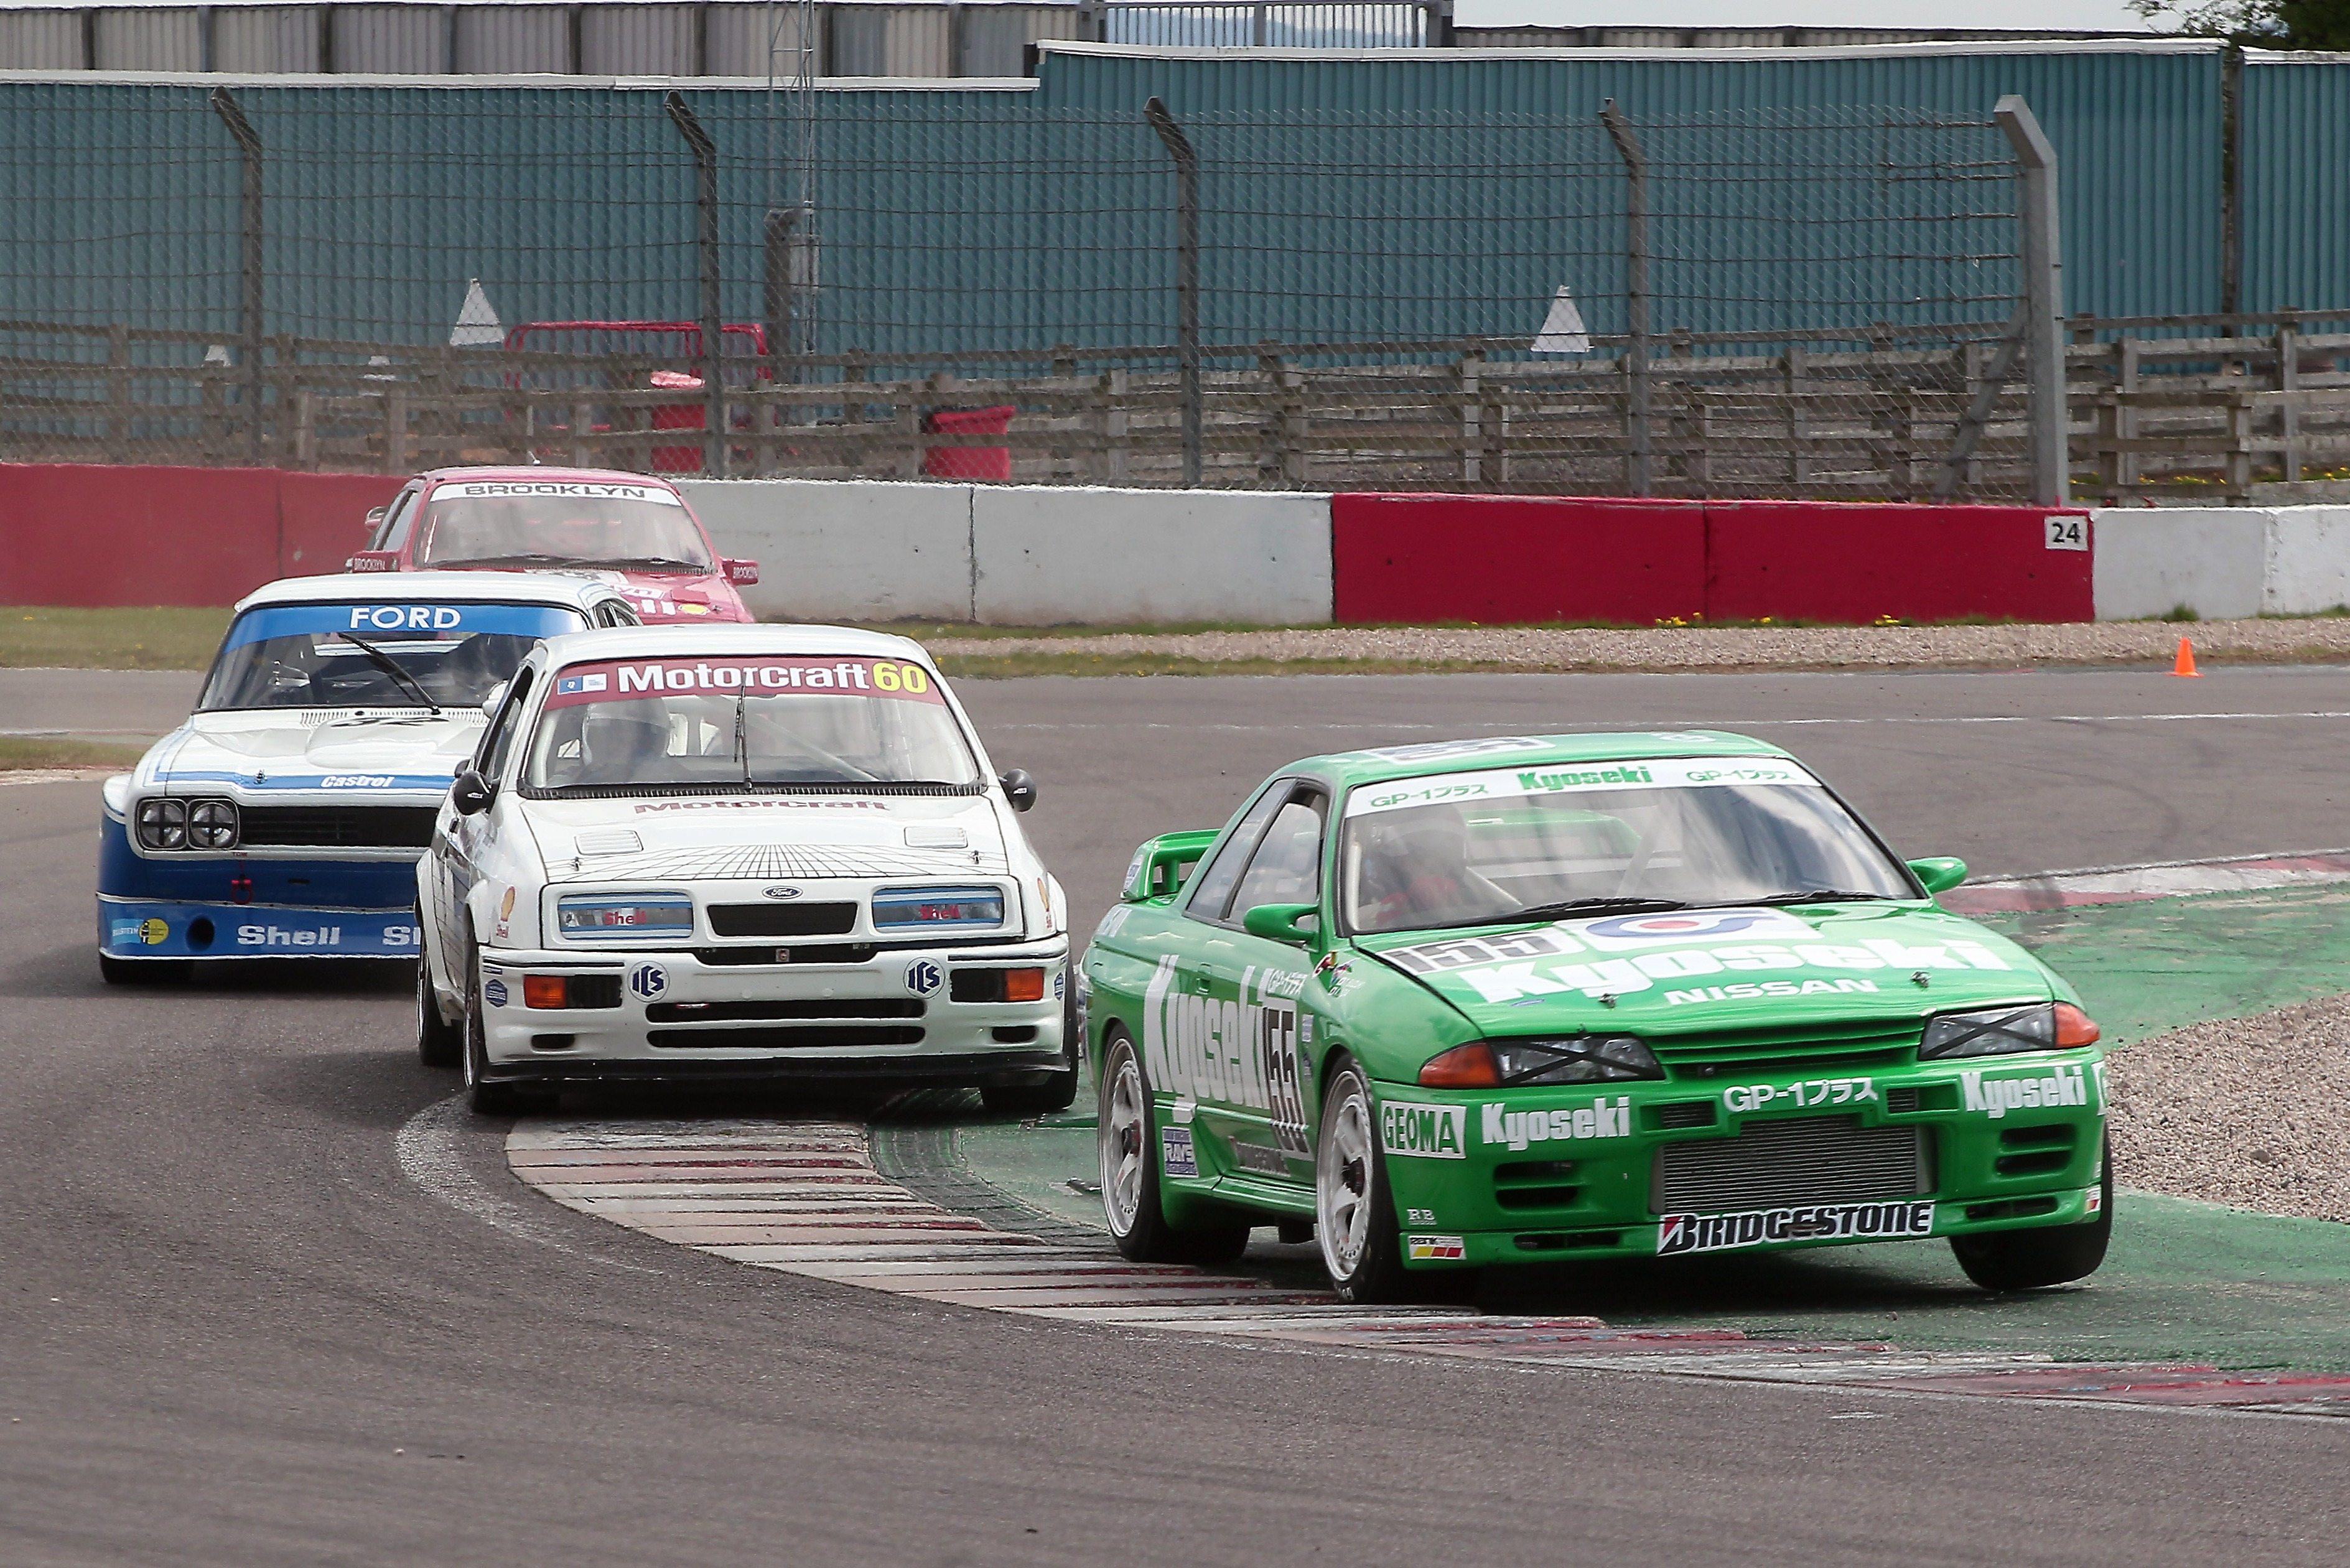 Andy Middlehurst/Jonathan Bailey (Nissan Skyline), Historic Touring Car Challenge, Donington Park 2021